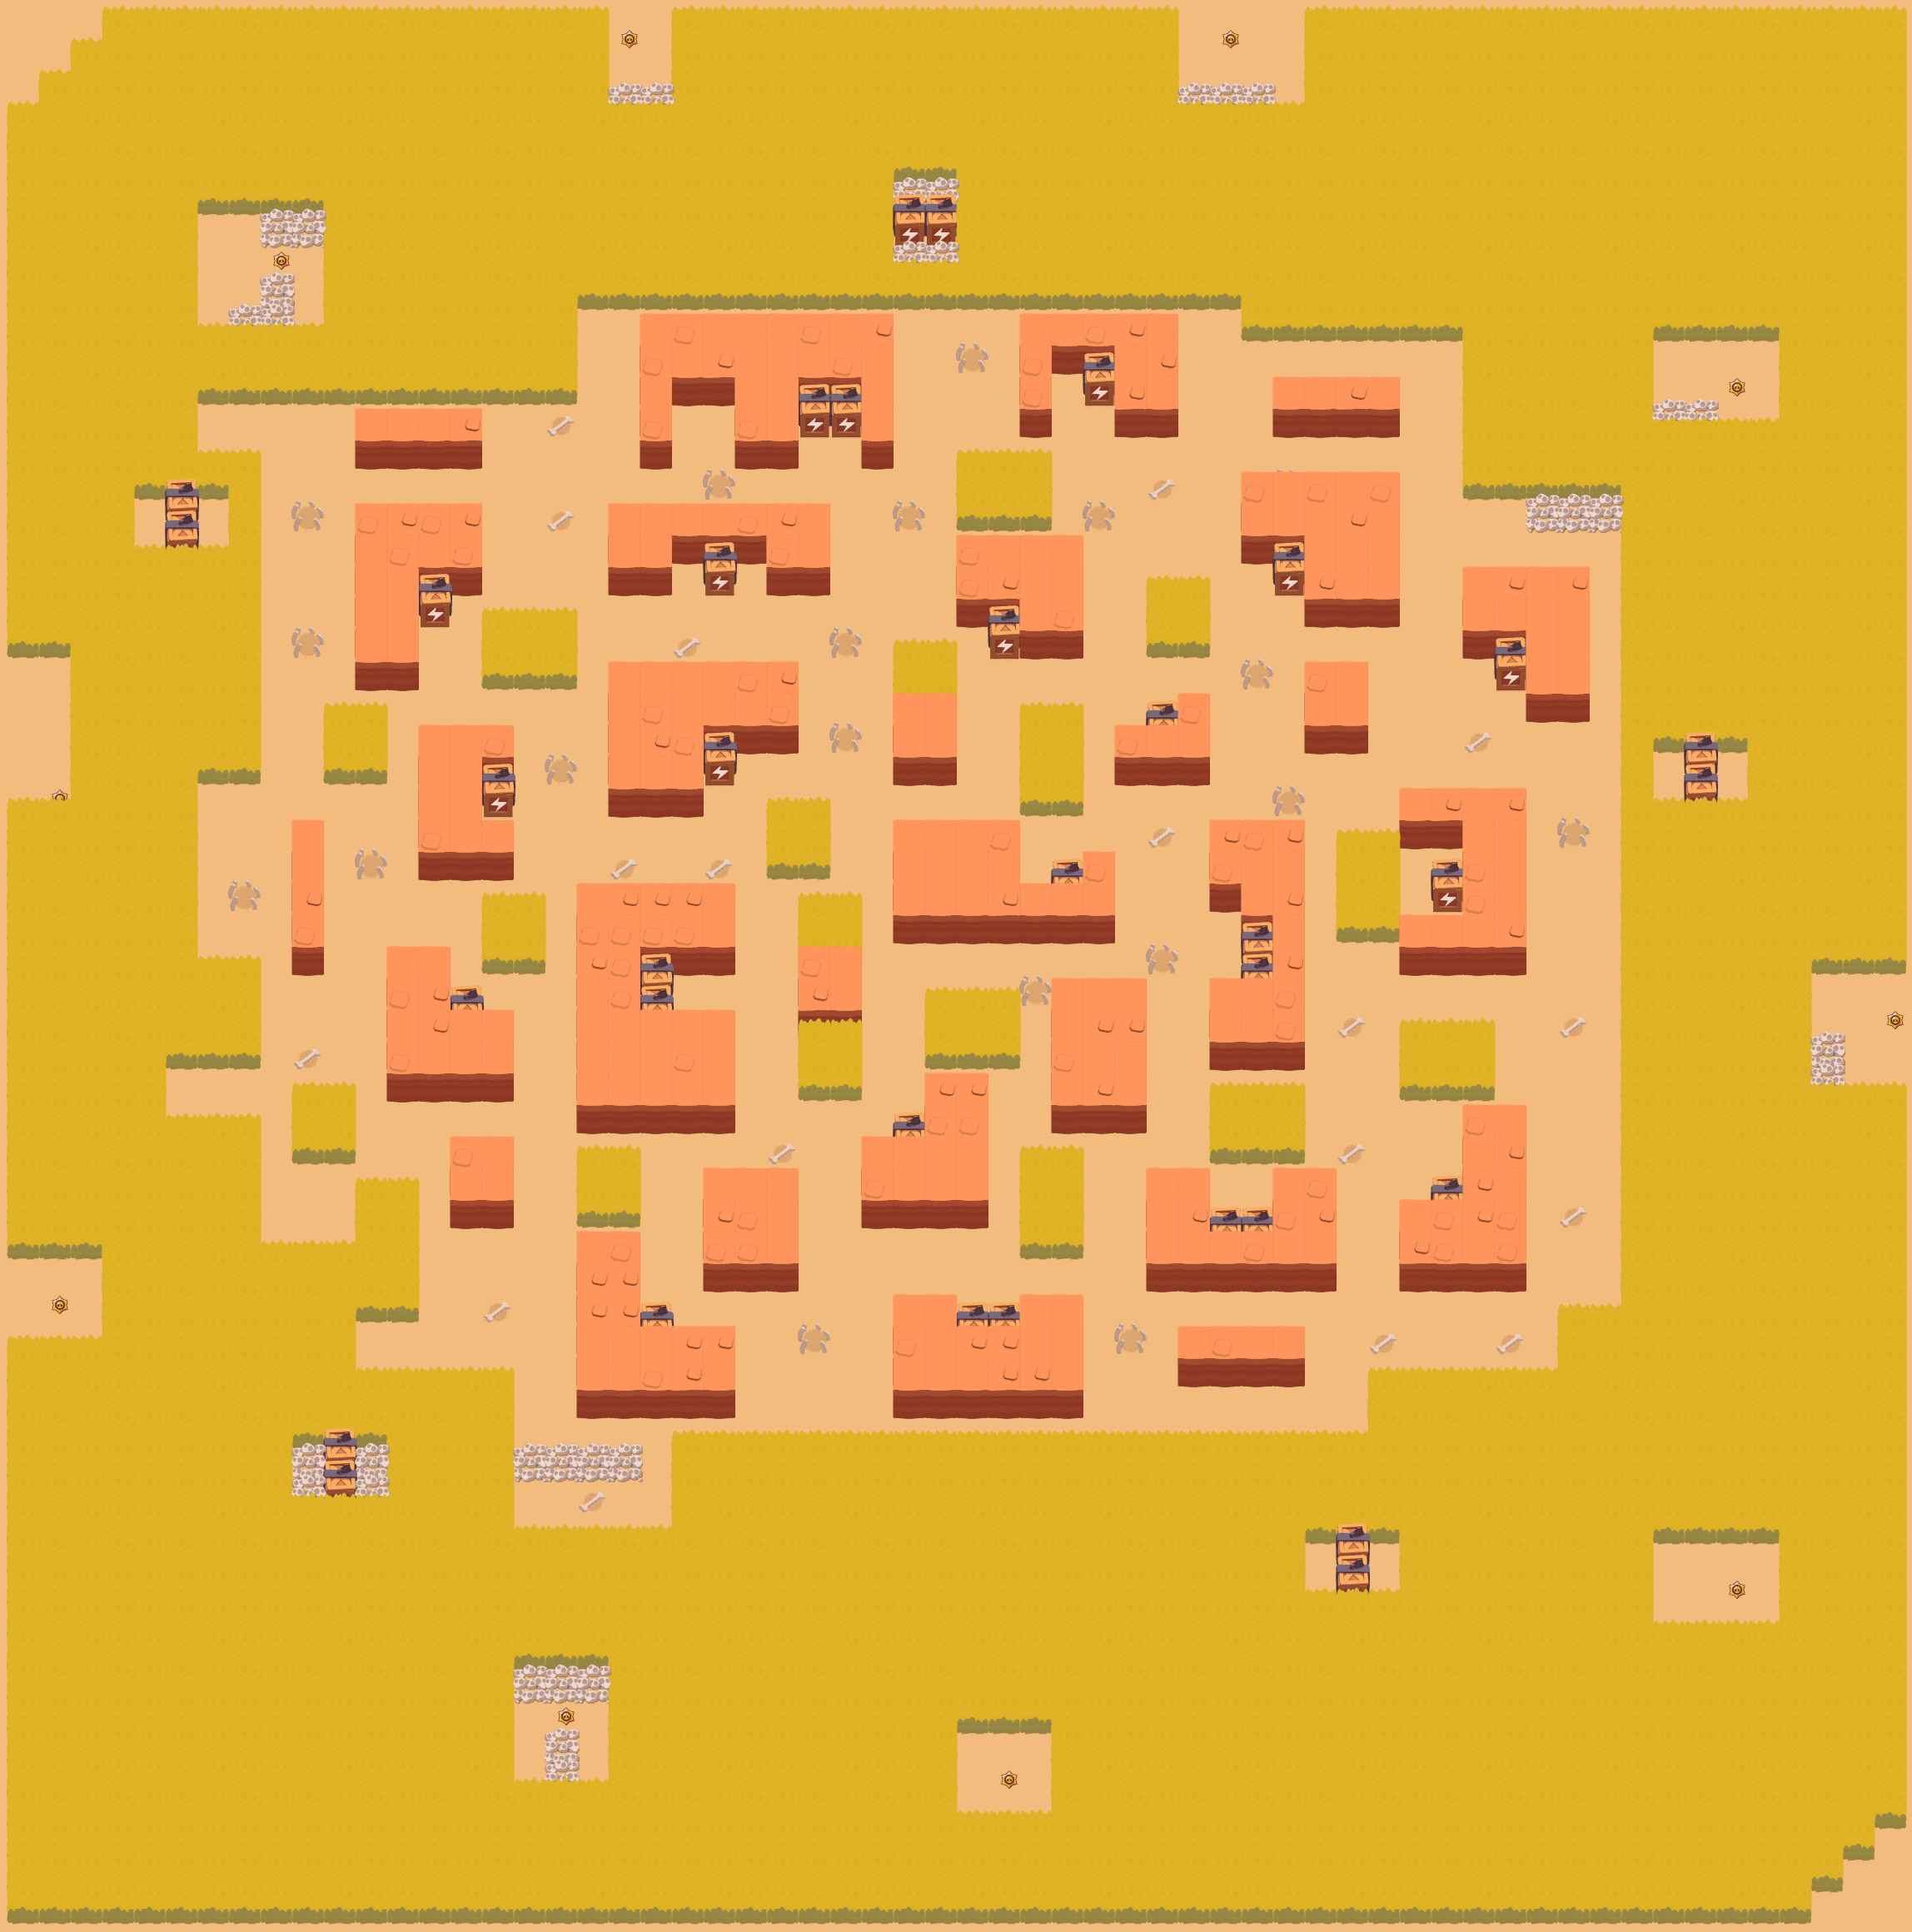 Карта STORMY PLAINS в режиме Конфронтация (Showdown)